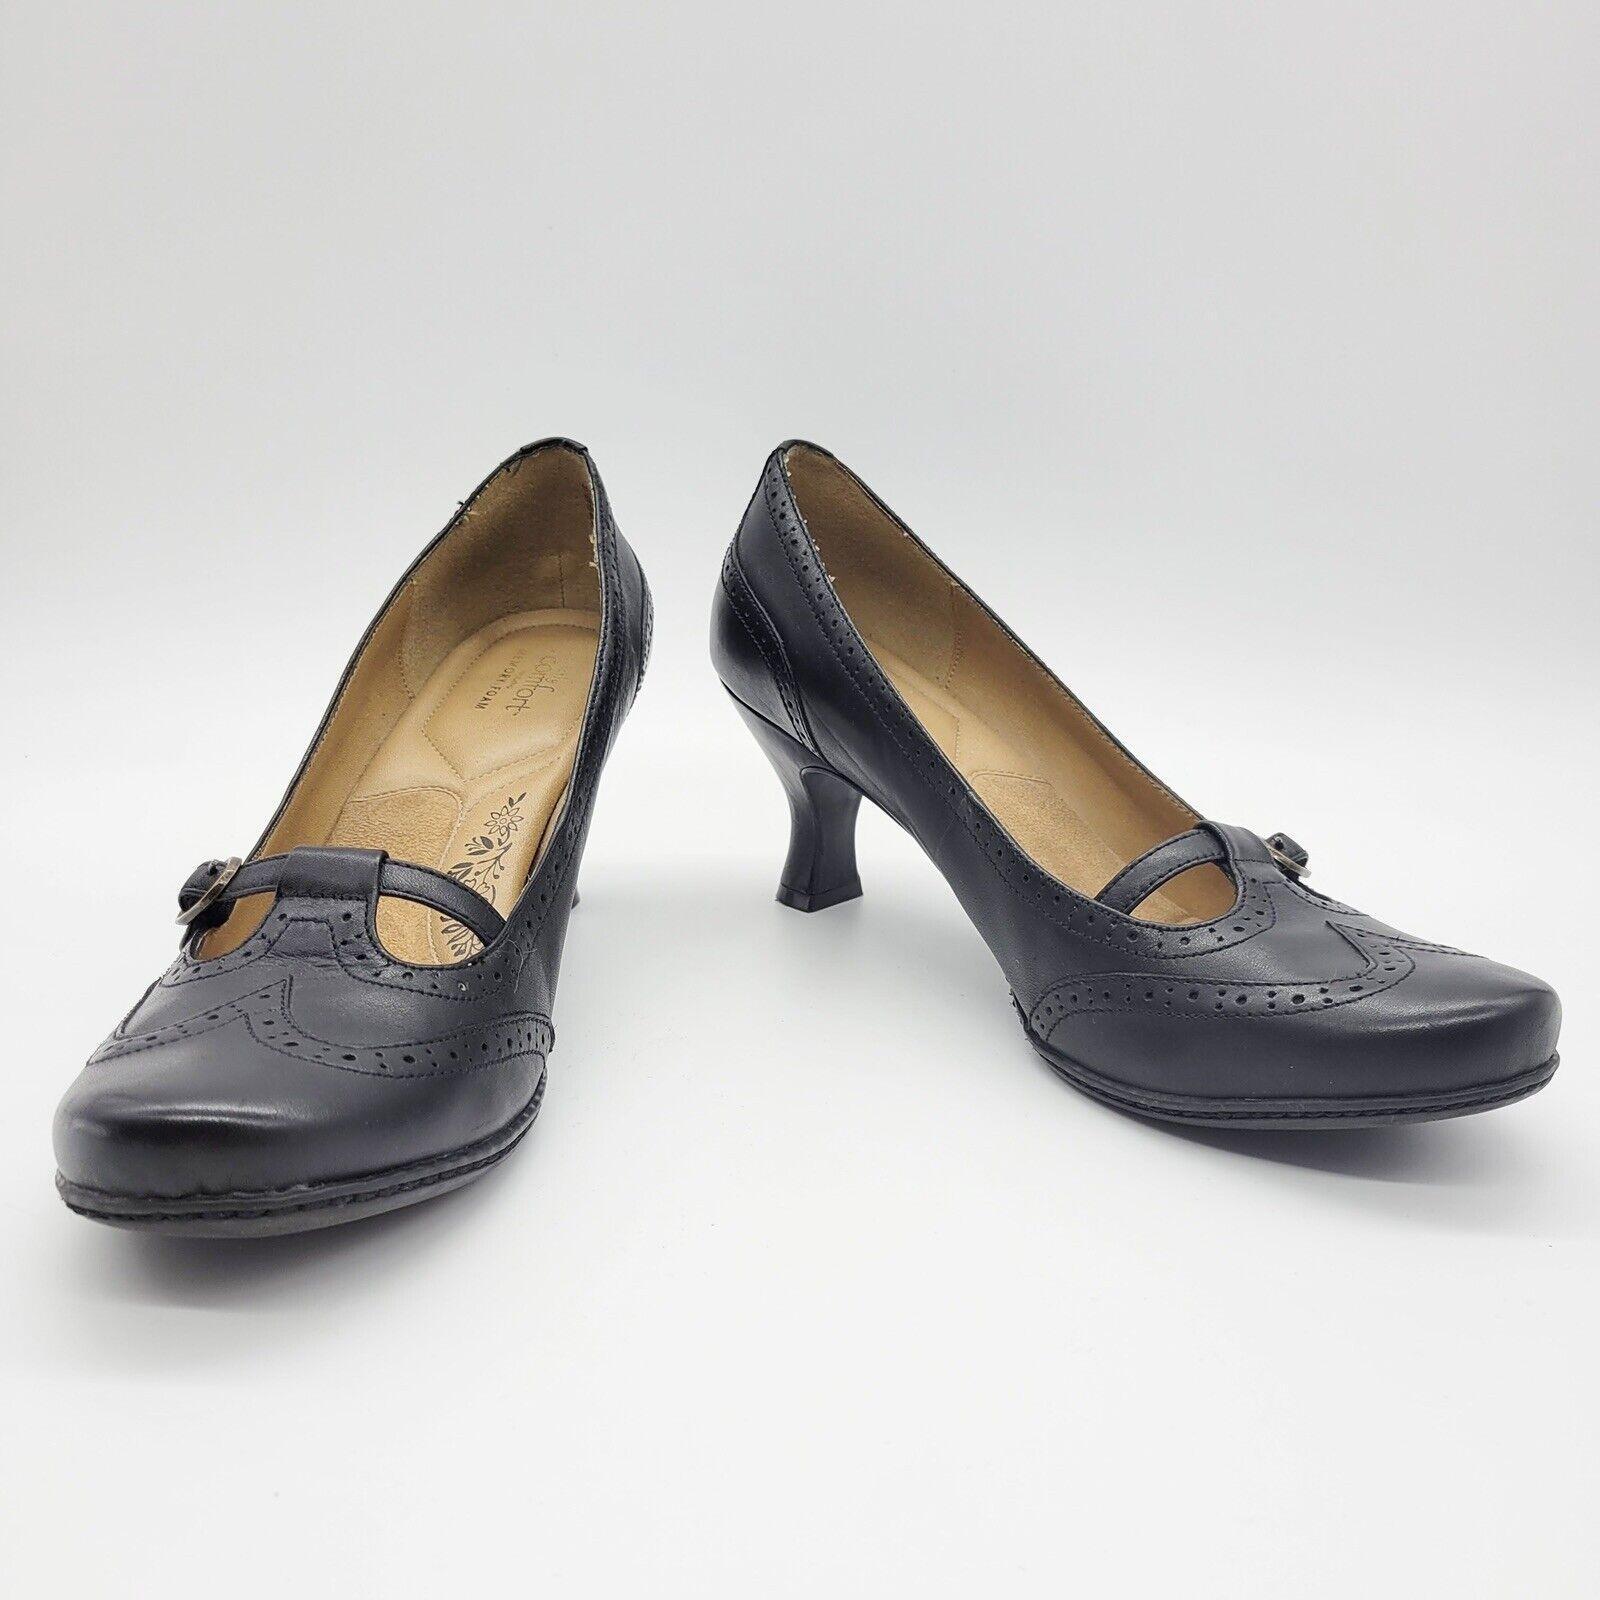 Strictly Comfort Heels 10 Women's Black Leather Kitten Heel Mary Jane Shoes